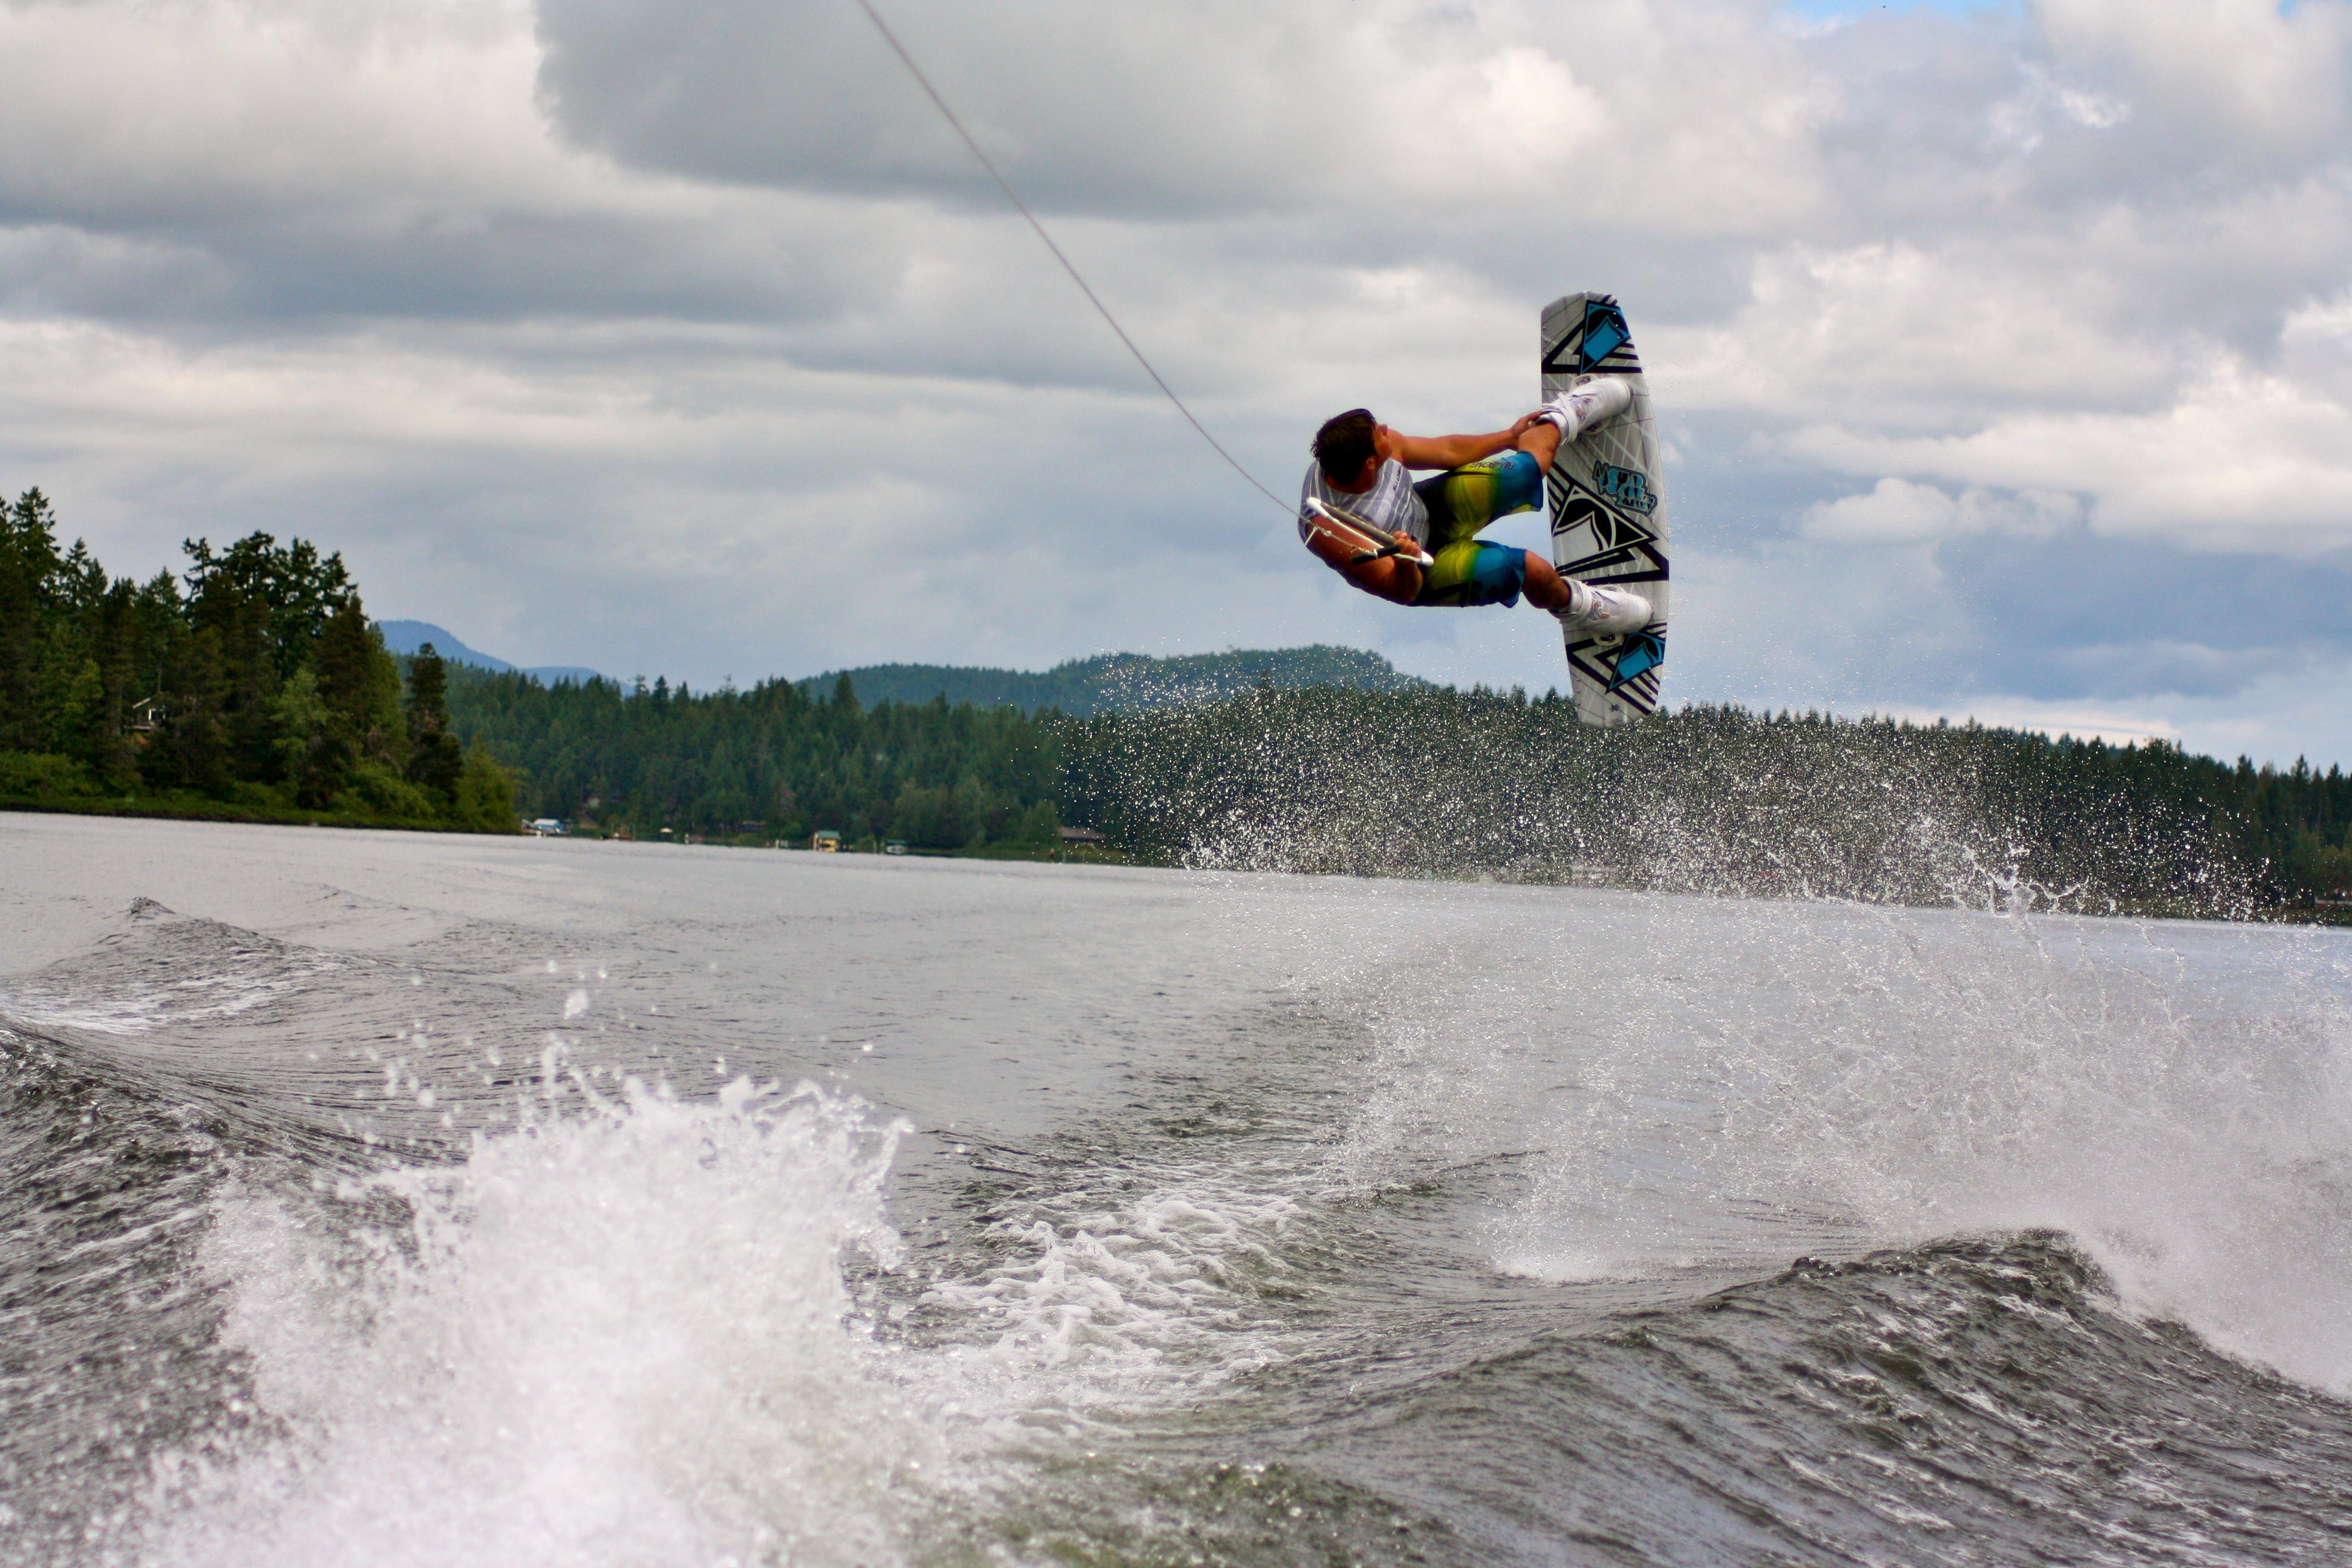 Wakeboarding tricks